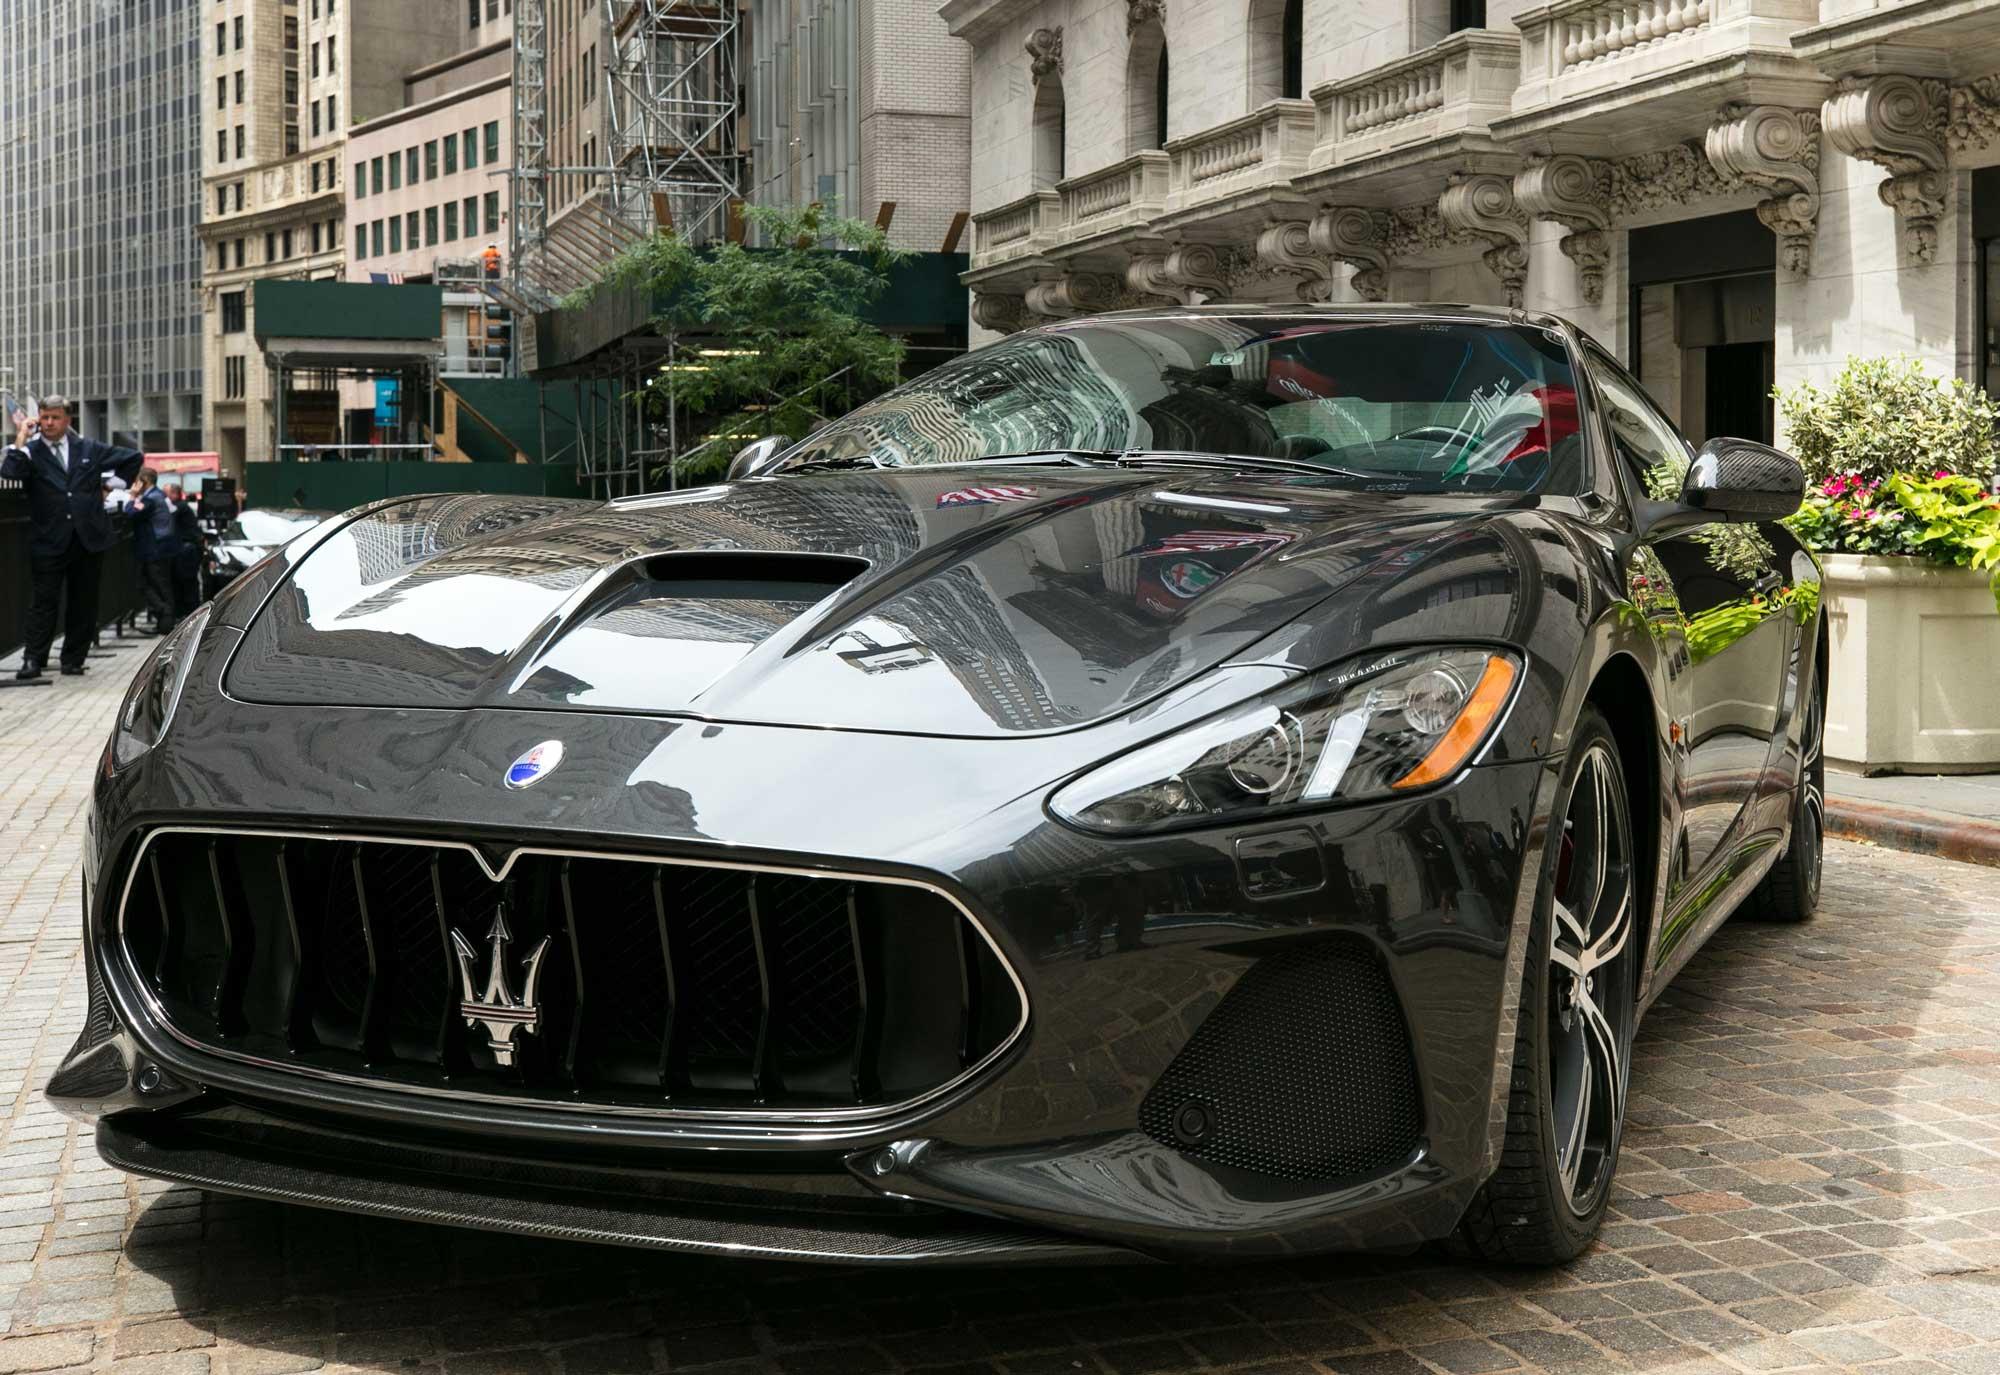 Maserati-GranTurismo-MC-MY18-at-New-York-Stock-Exchange_2017_1.jpg